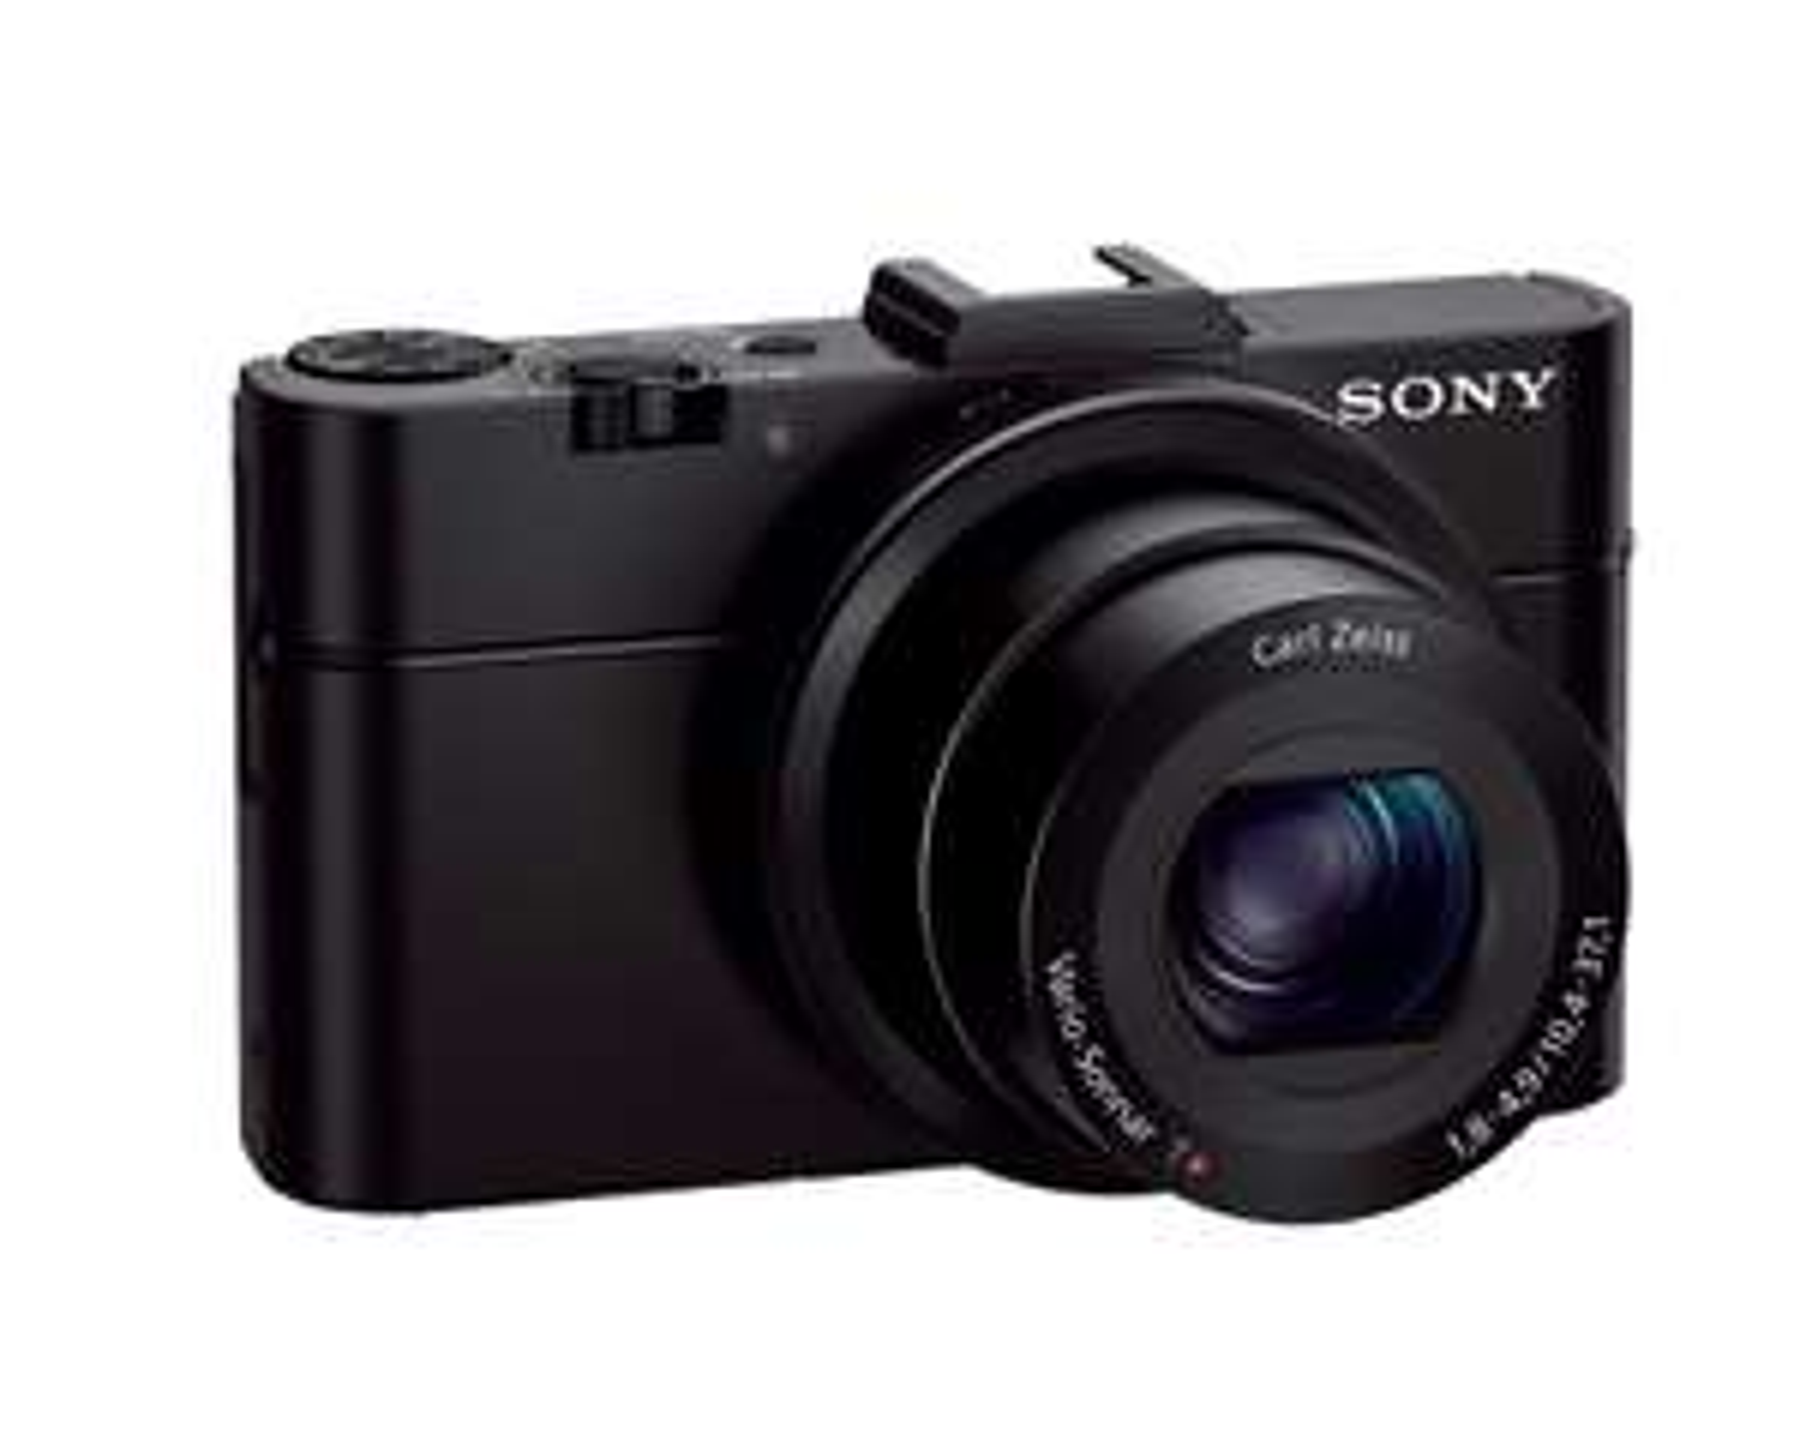 Appareil photo Sony RX-100 MK II 28-100mm f1.8-4.9  (Avec ODR 50 €)